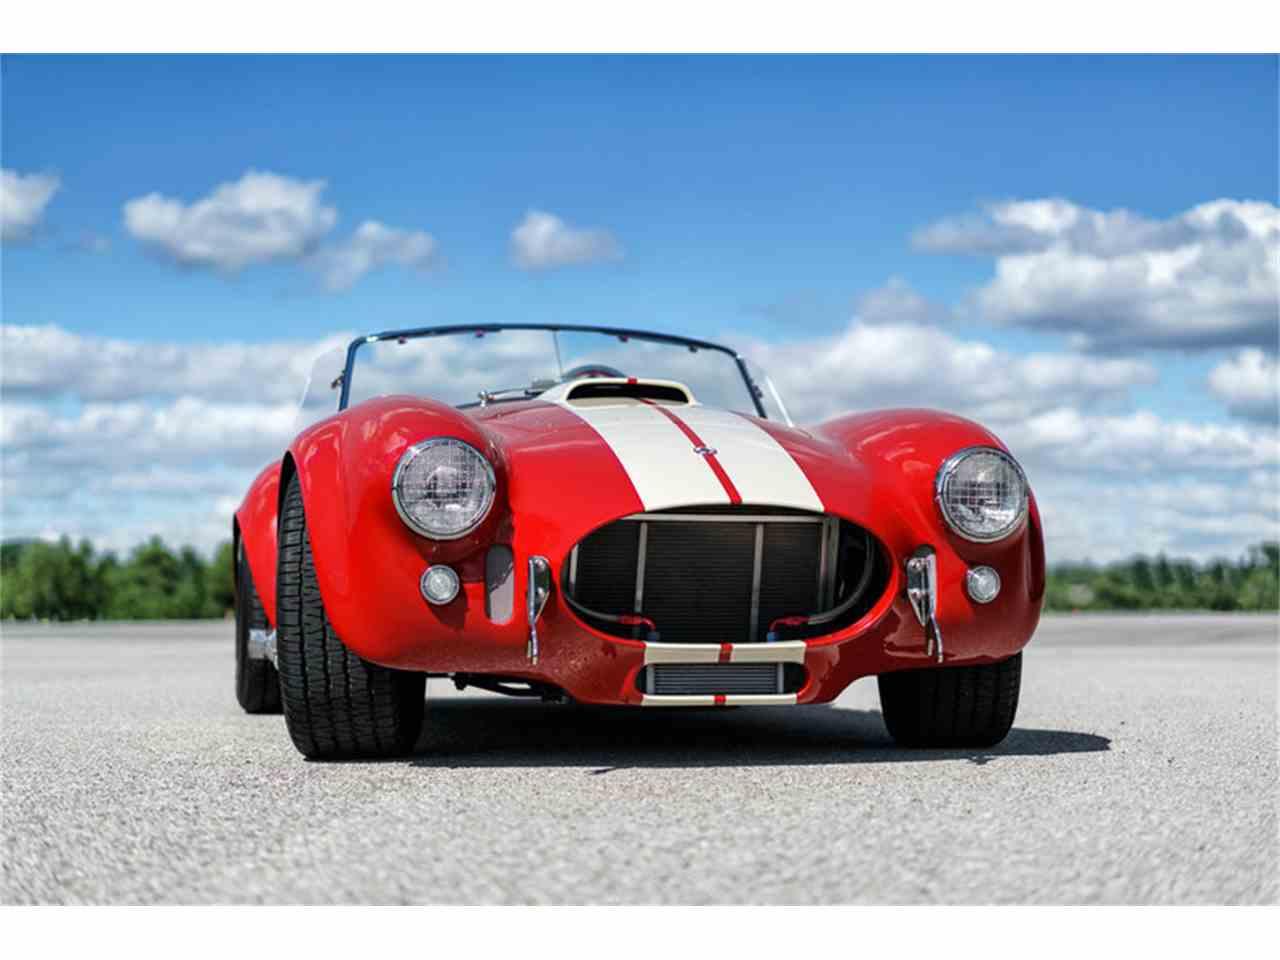 Large Picture of Classic '65 Cobra located in Missouri - $64,995.00 - I3CA